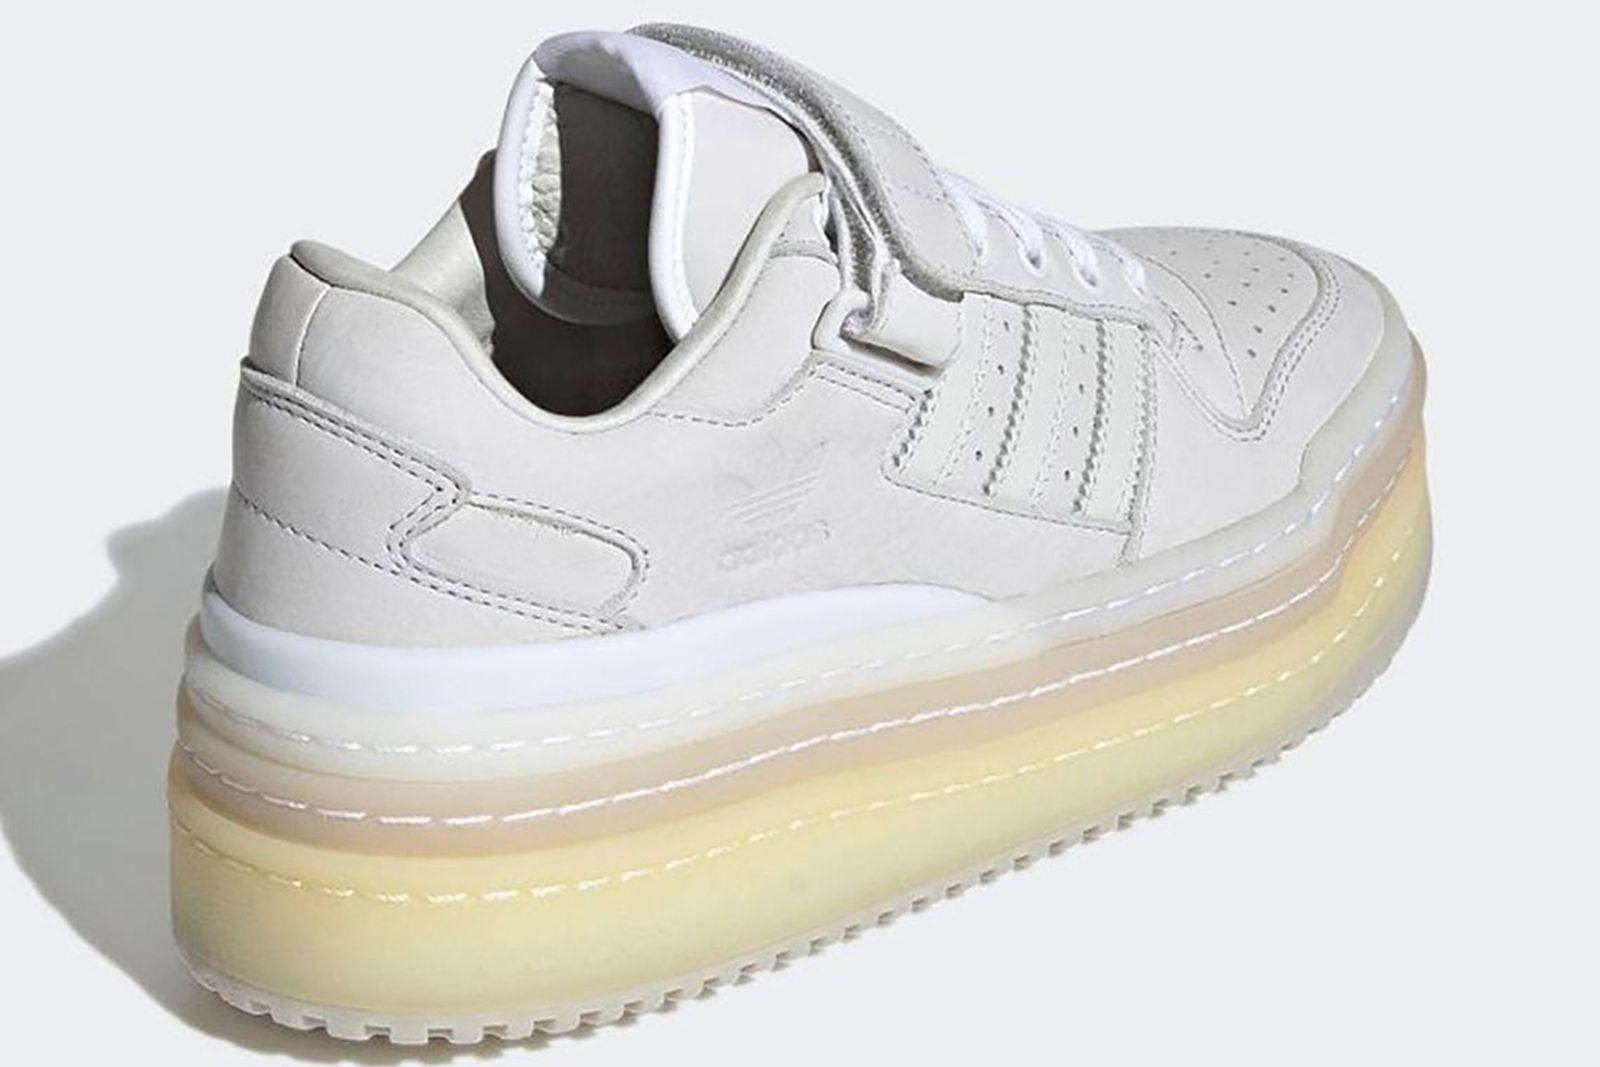 adidas-triple-platforum-lo-crystal-white-release-date-price-02